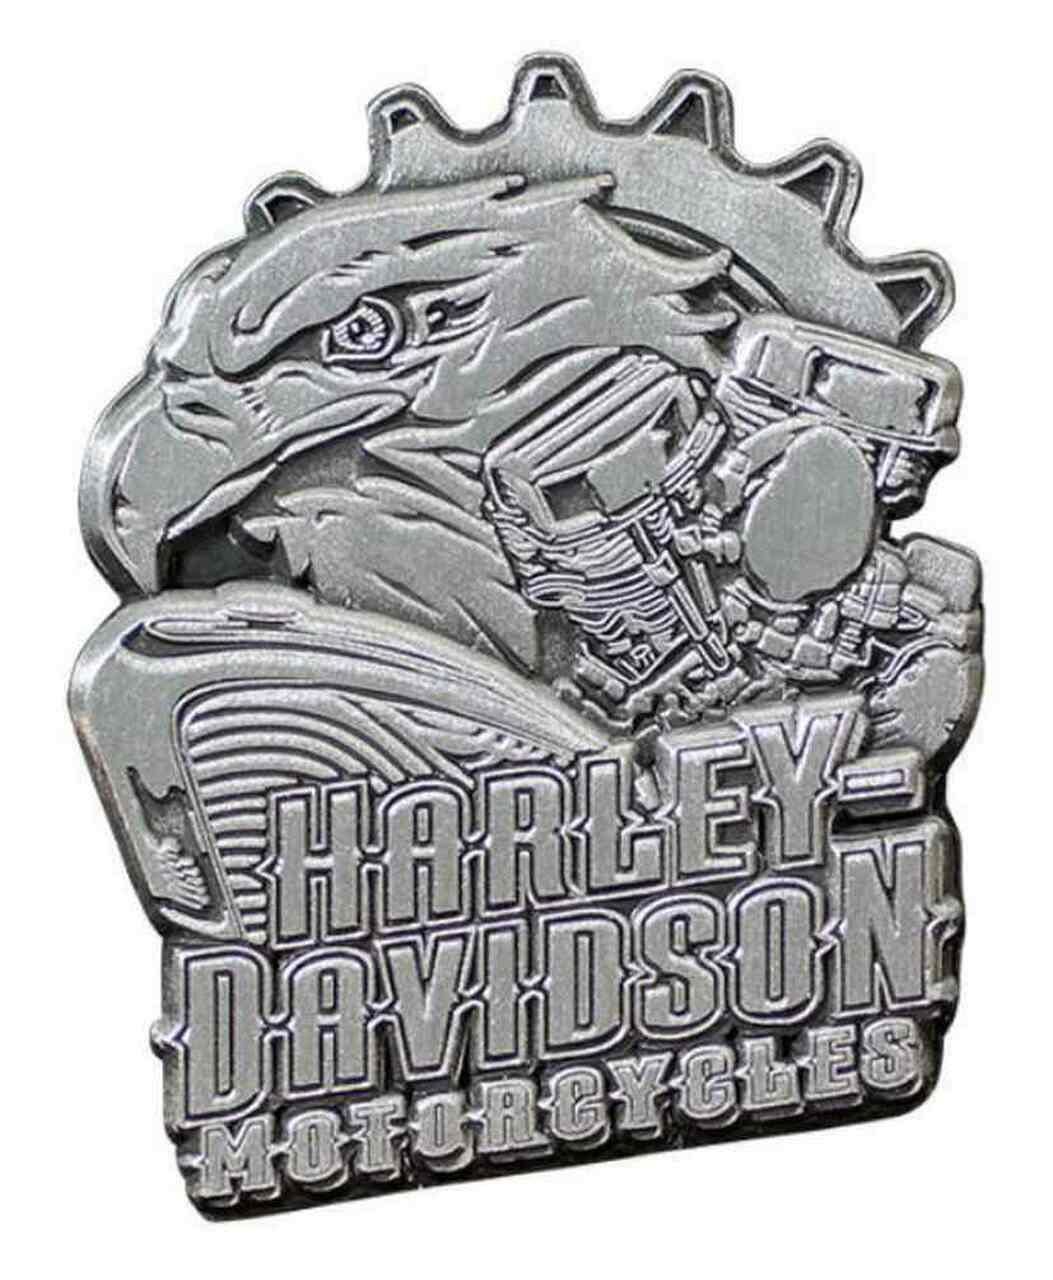 HARLEY DAVIDSON PIN, EAGLE ENGINE, ANTIQUED SILVER FINISH